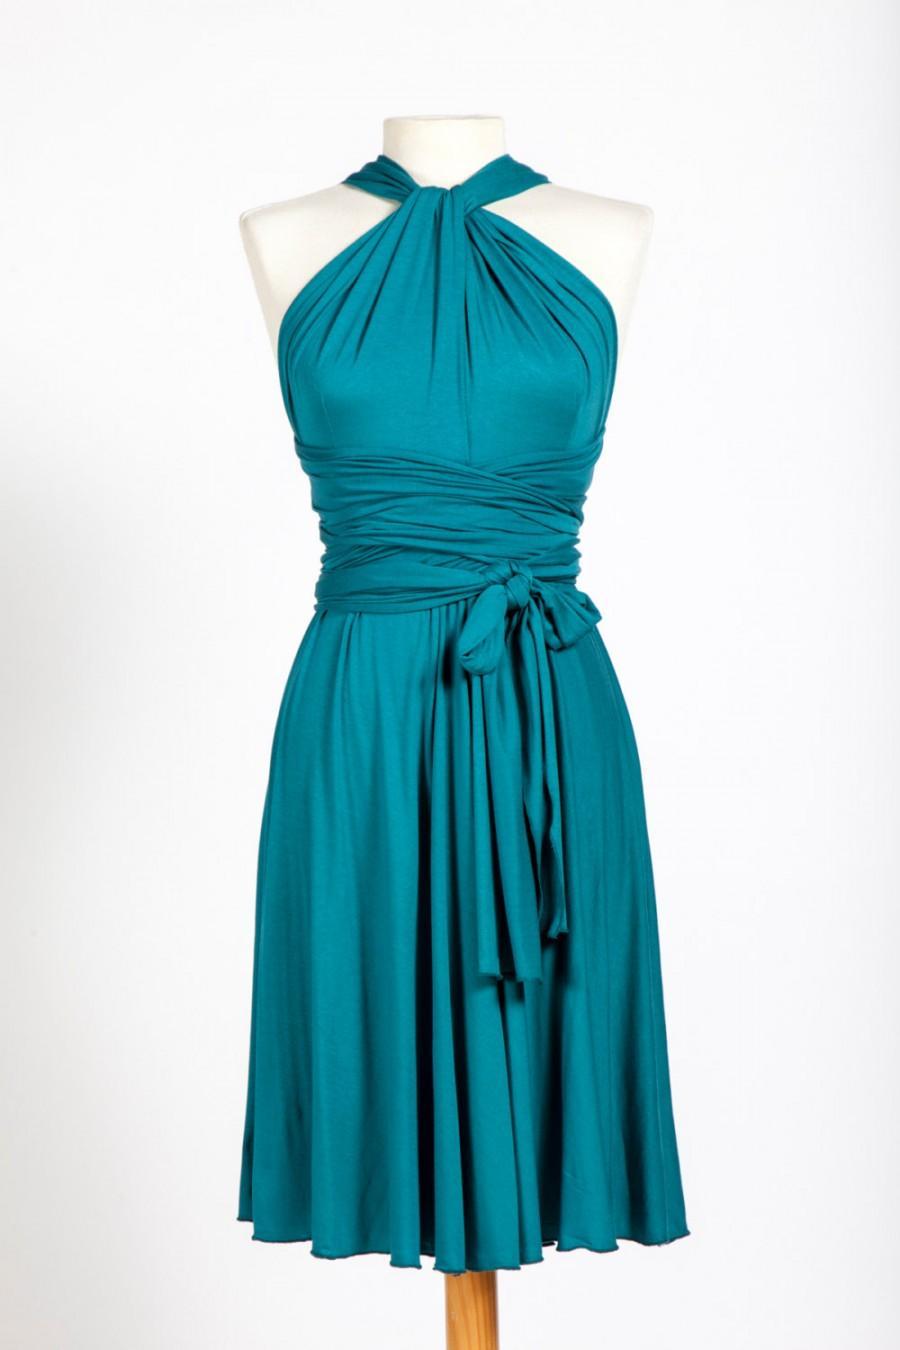 Turquoise Infinity Dresses Knee Length, Bridesmaid Dresses Infinity ...